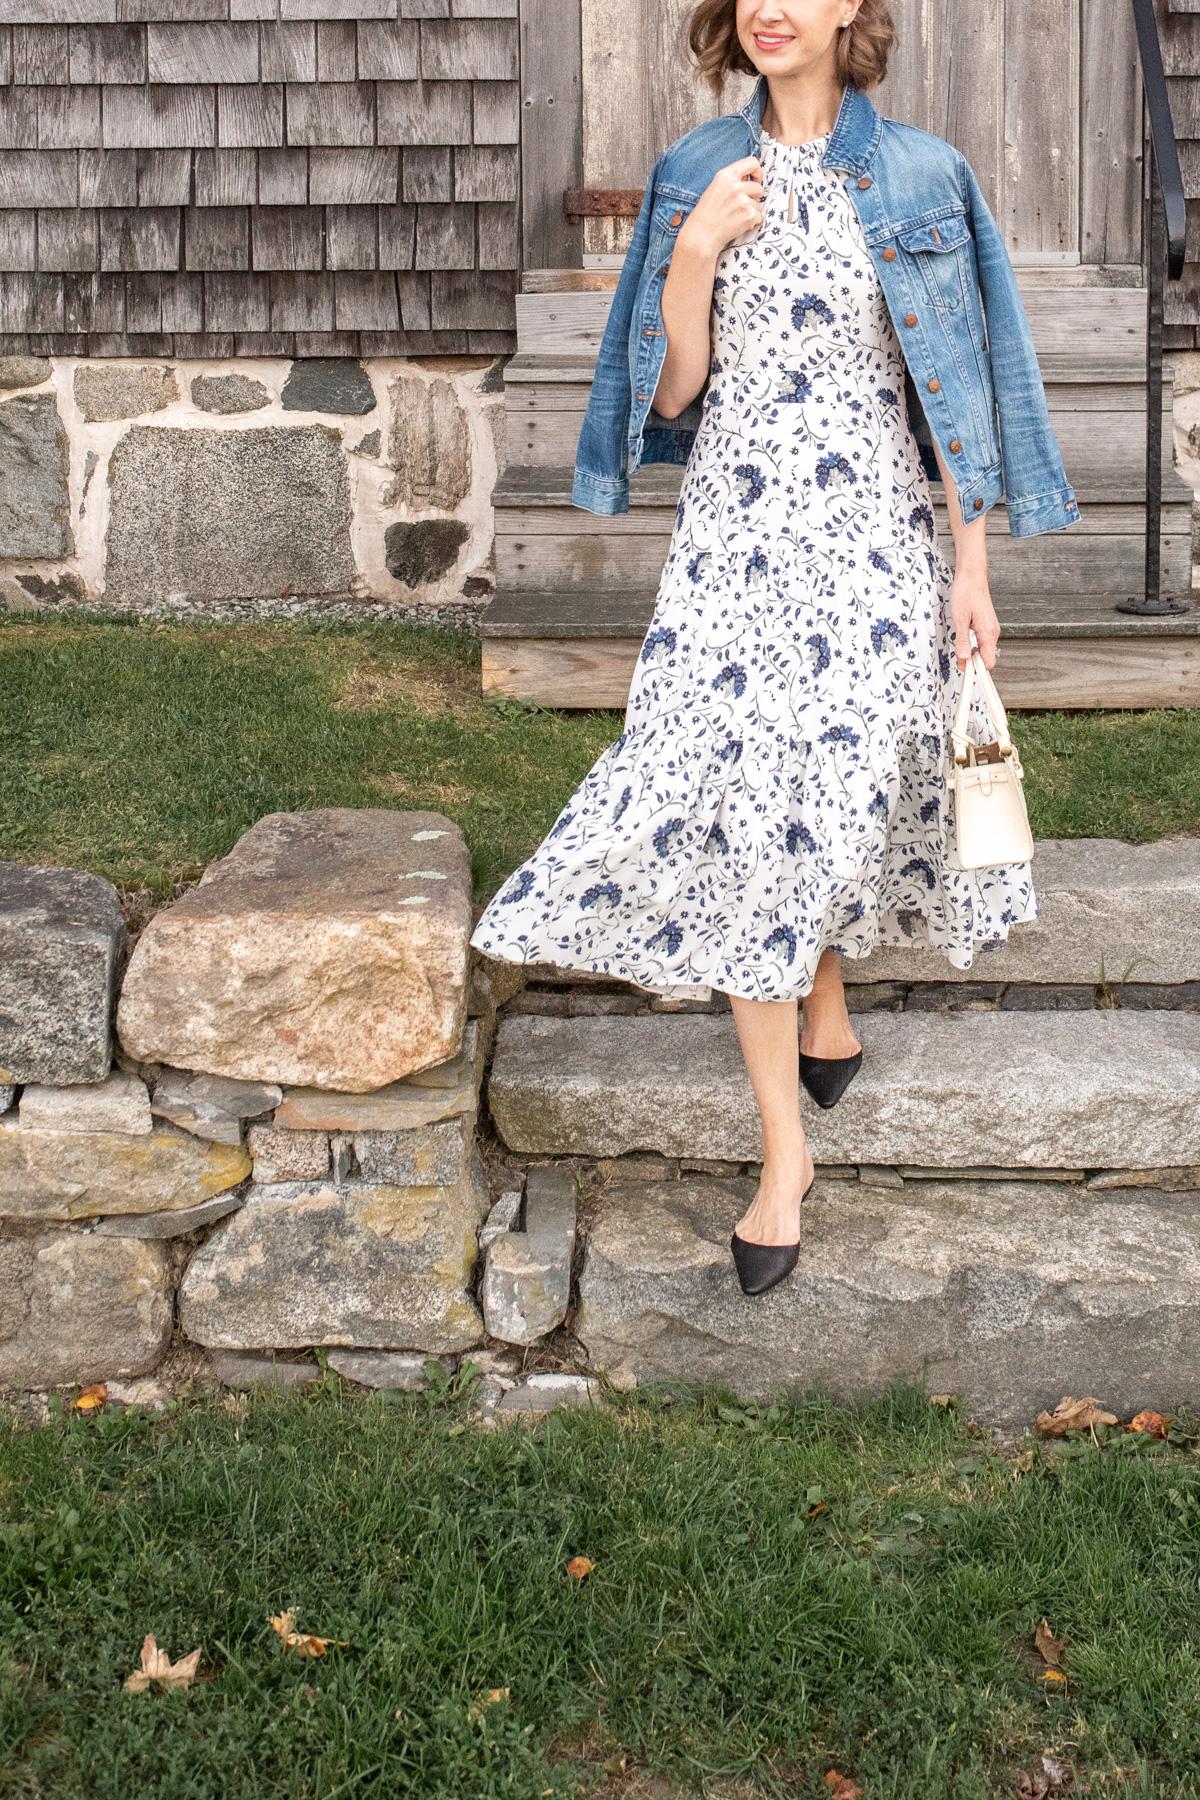 Stacie Flinner x Charlotte Brody Dress-5.jpg